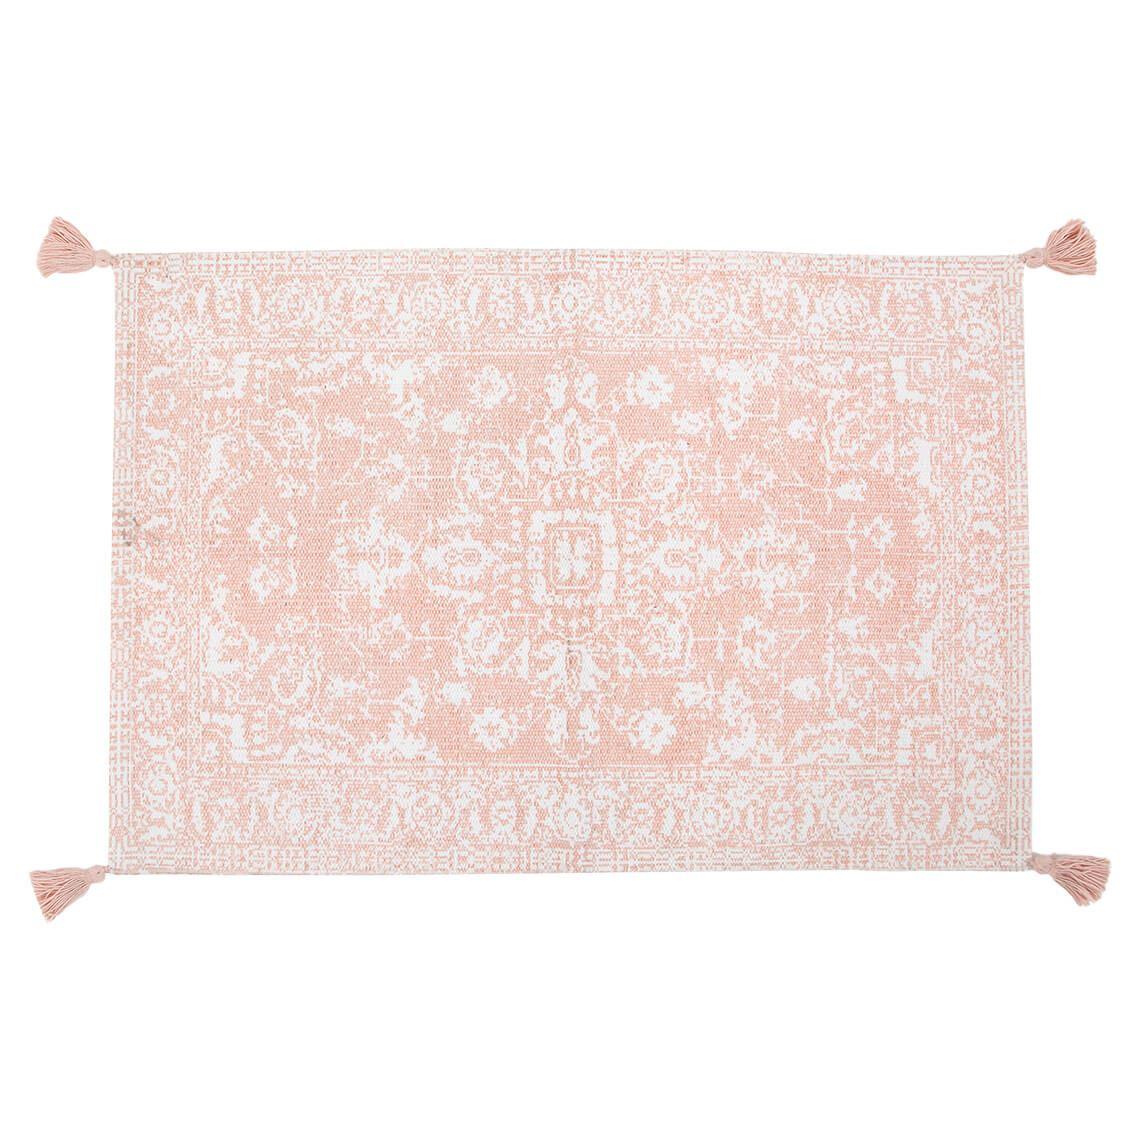 Belair Floor Floor Mat Size W 60cm x D 90cm x H 1cm in Rose Smoke 100% Cotton Freedom